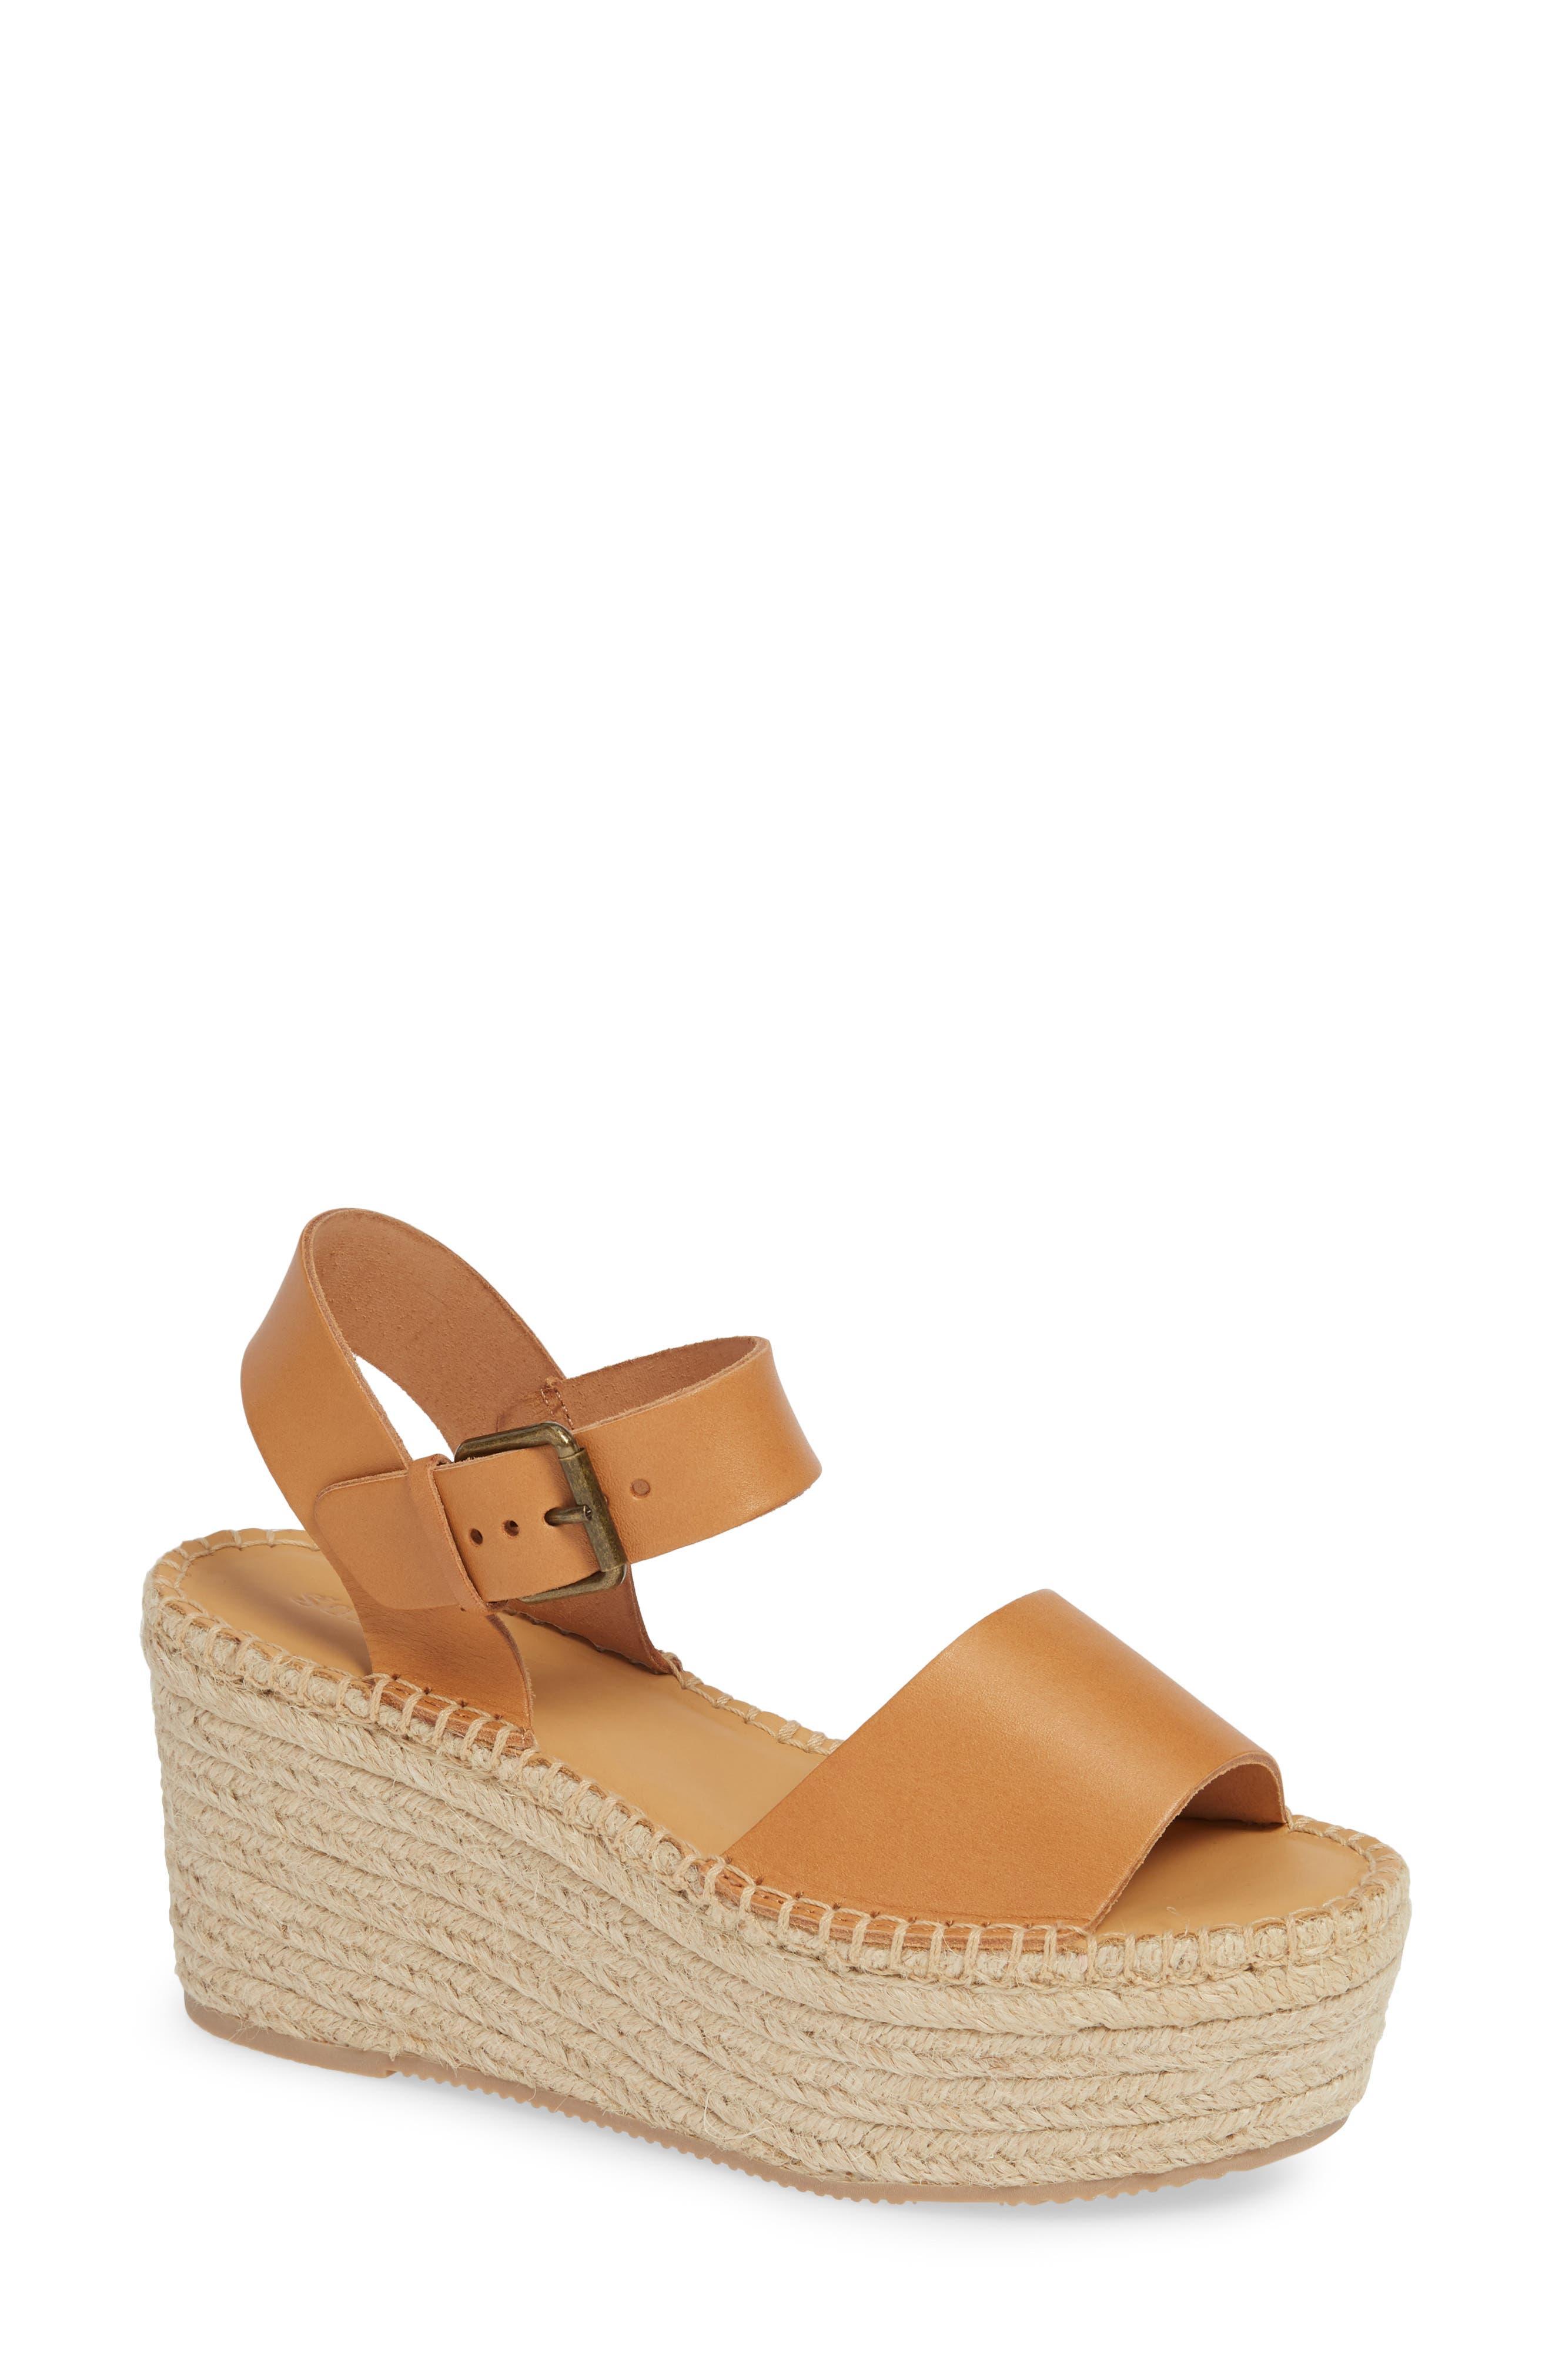 Soludos Minorca Platform Wedge Sandal, Brown